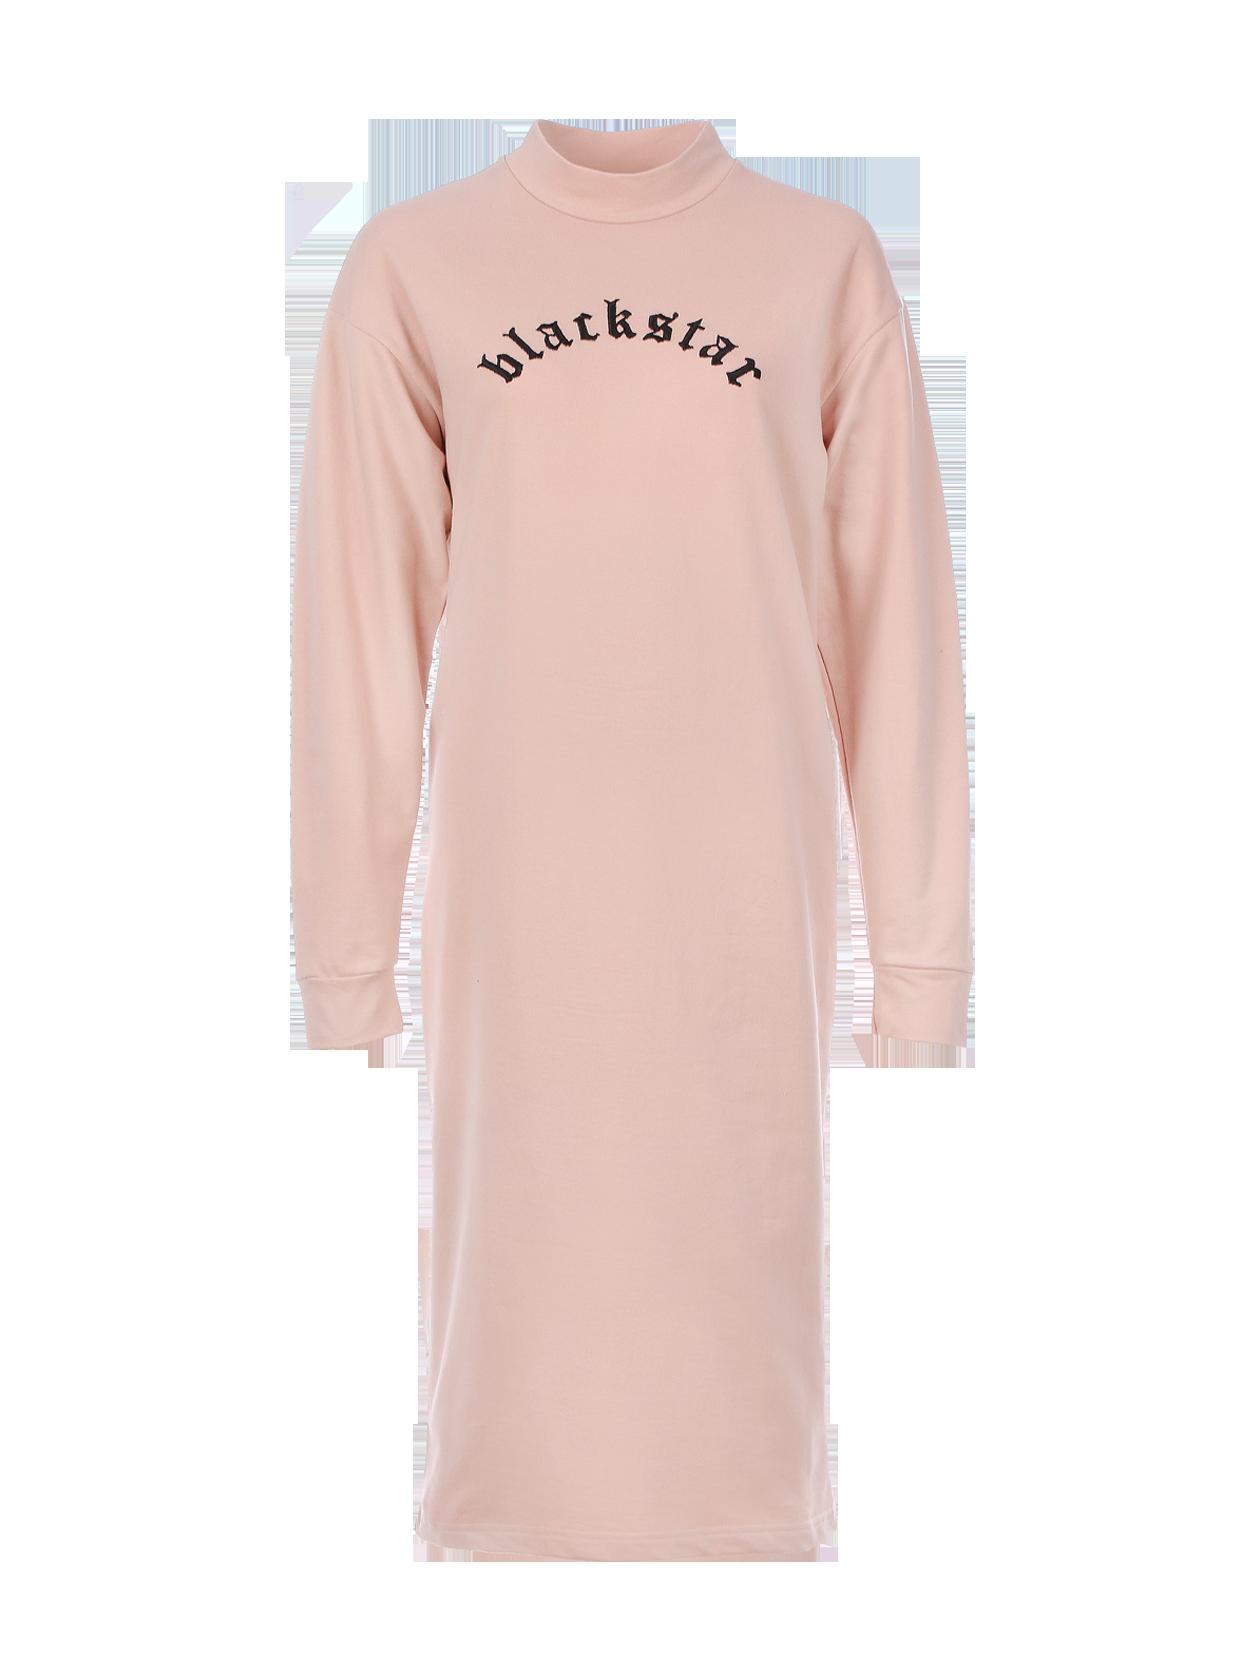 Womens dress PLAIN